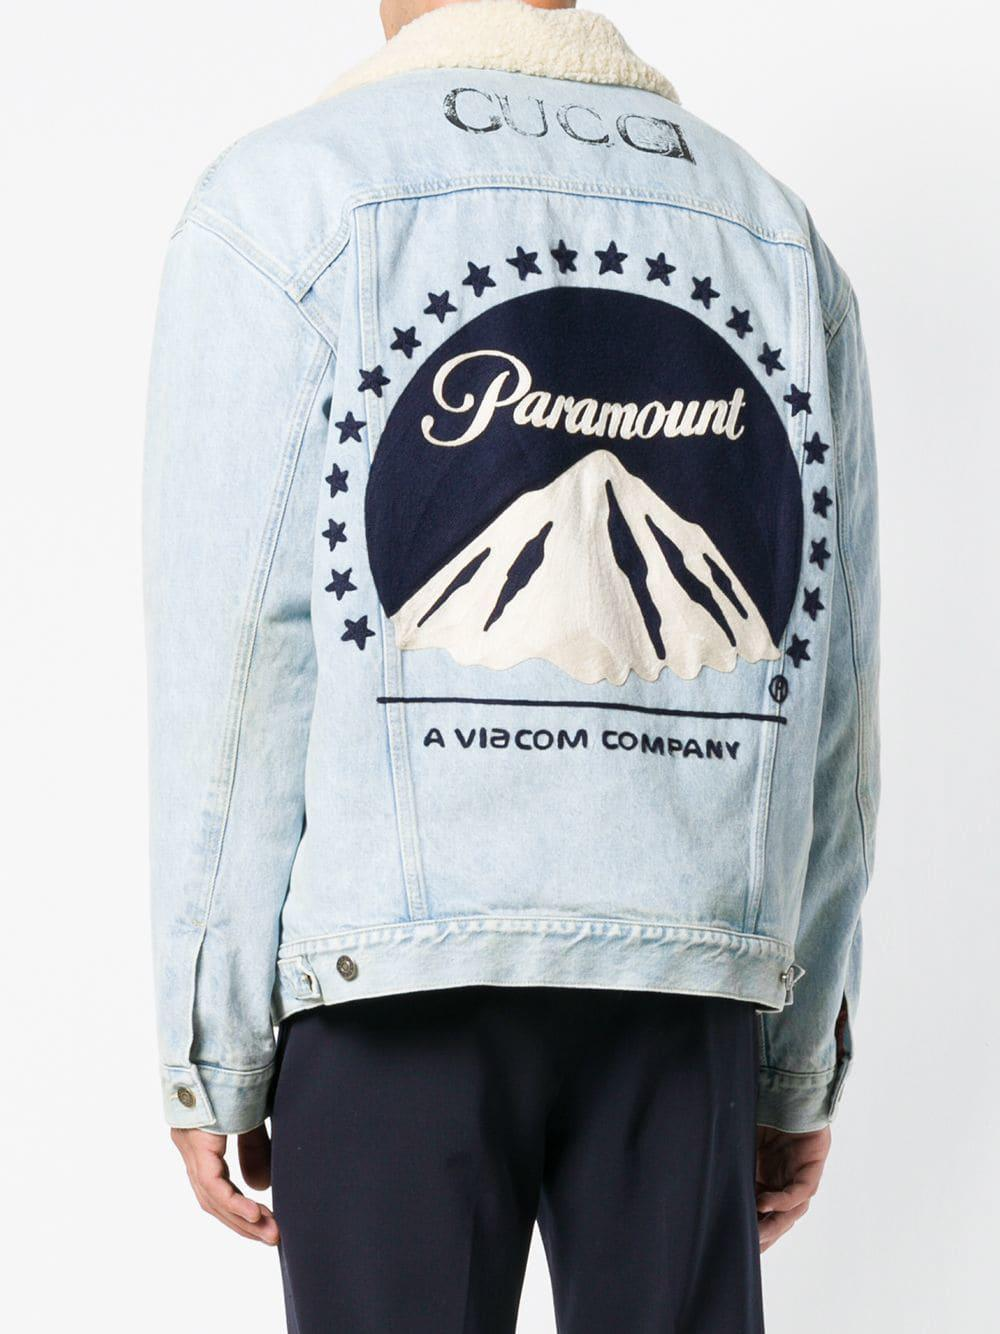 d029730f7 Gucci Paramount Print Denim Jacket in Blue for Men - Lyst